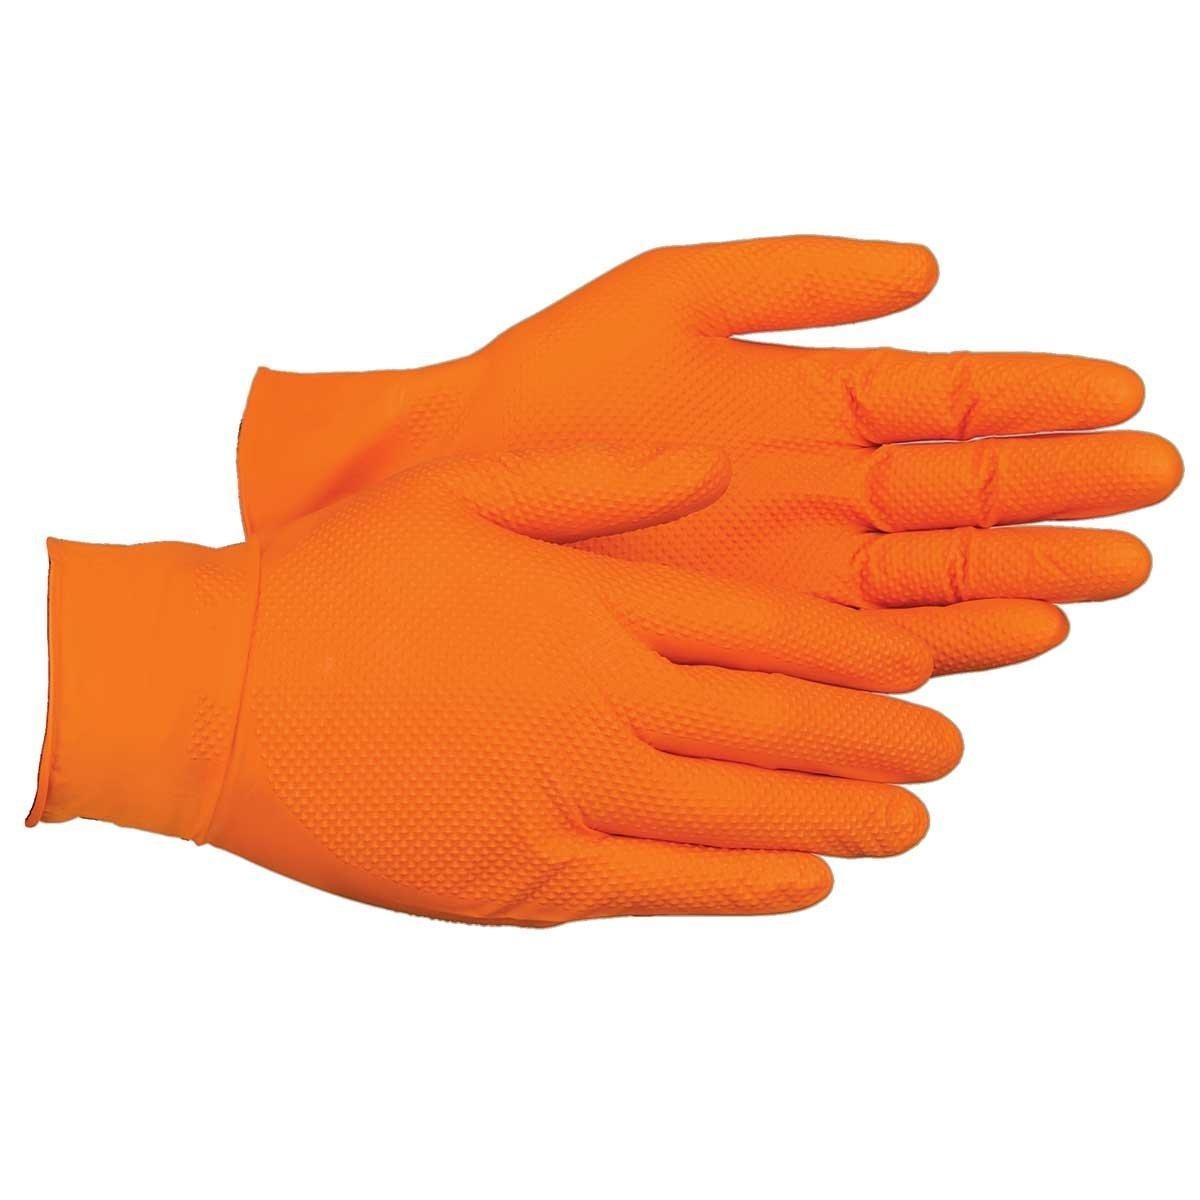 UltraSource Heavy Duty Nitrile Gloves, Tiger Grip, 7 mil Thickness, Hi-Vis Orange, X-Large (Pack of 90)